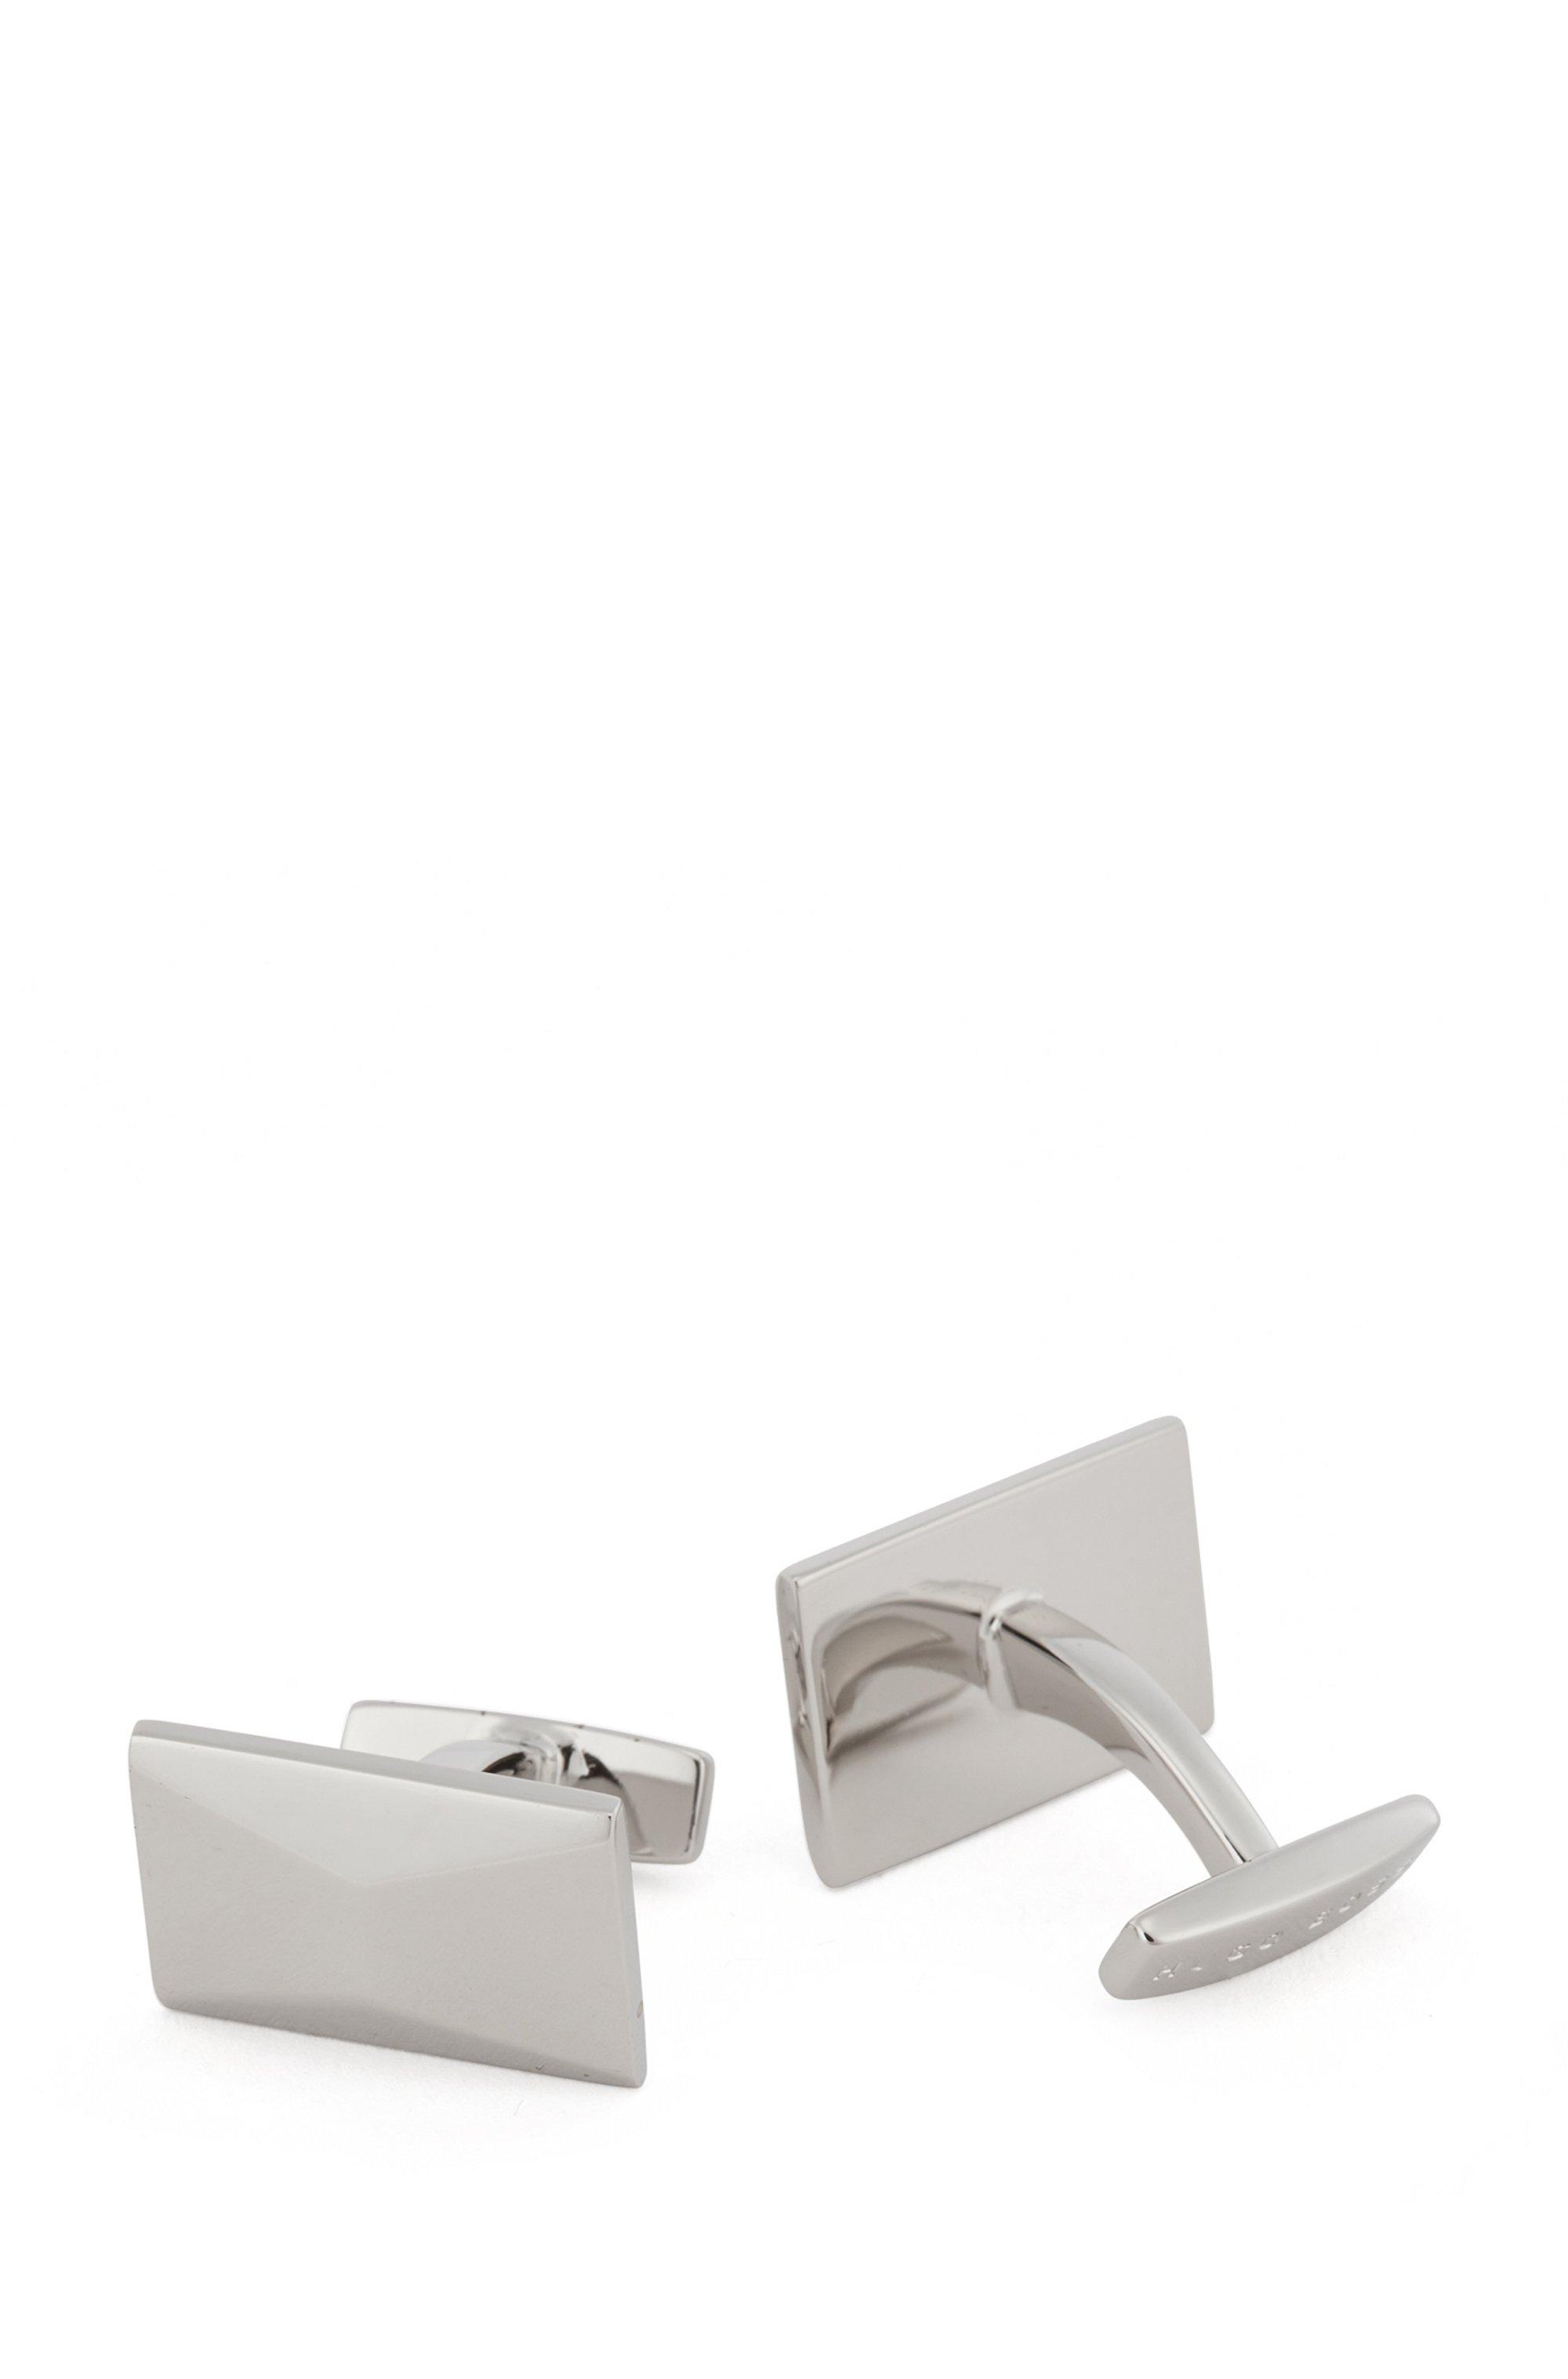 Gemelos rectangulares con superficie facetada, Plata